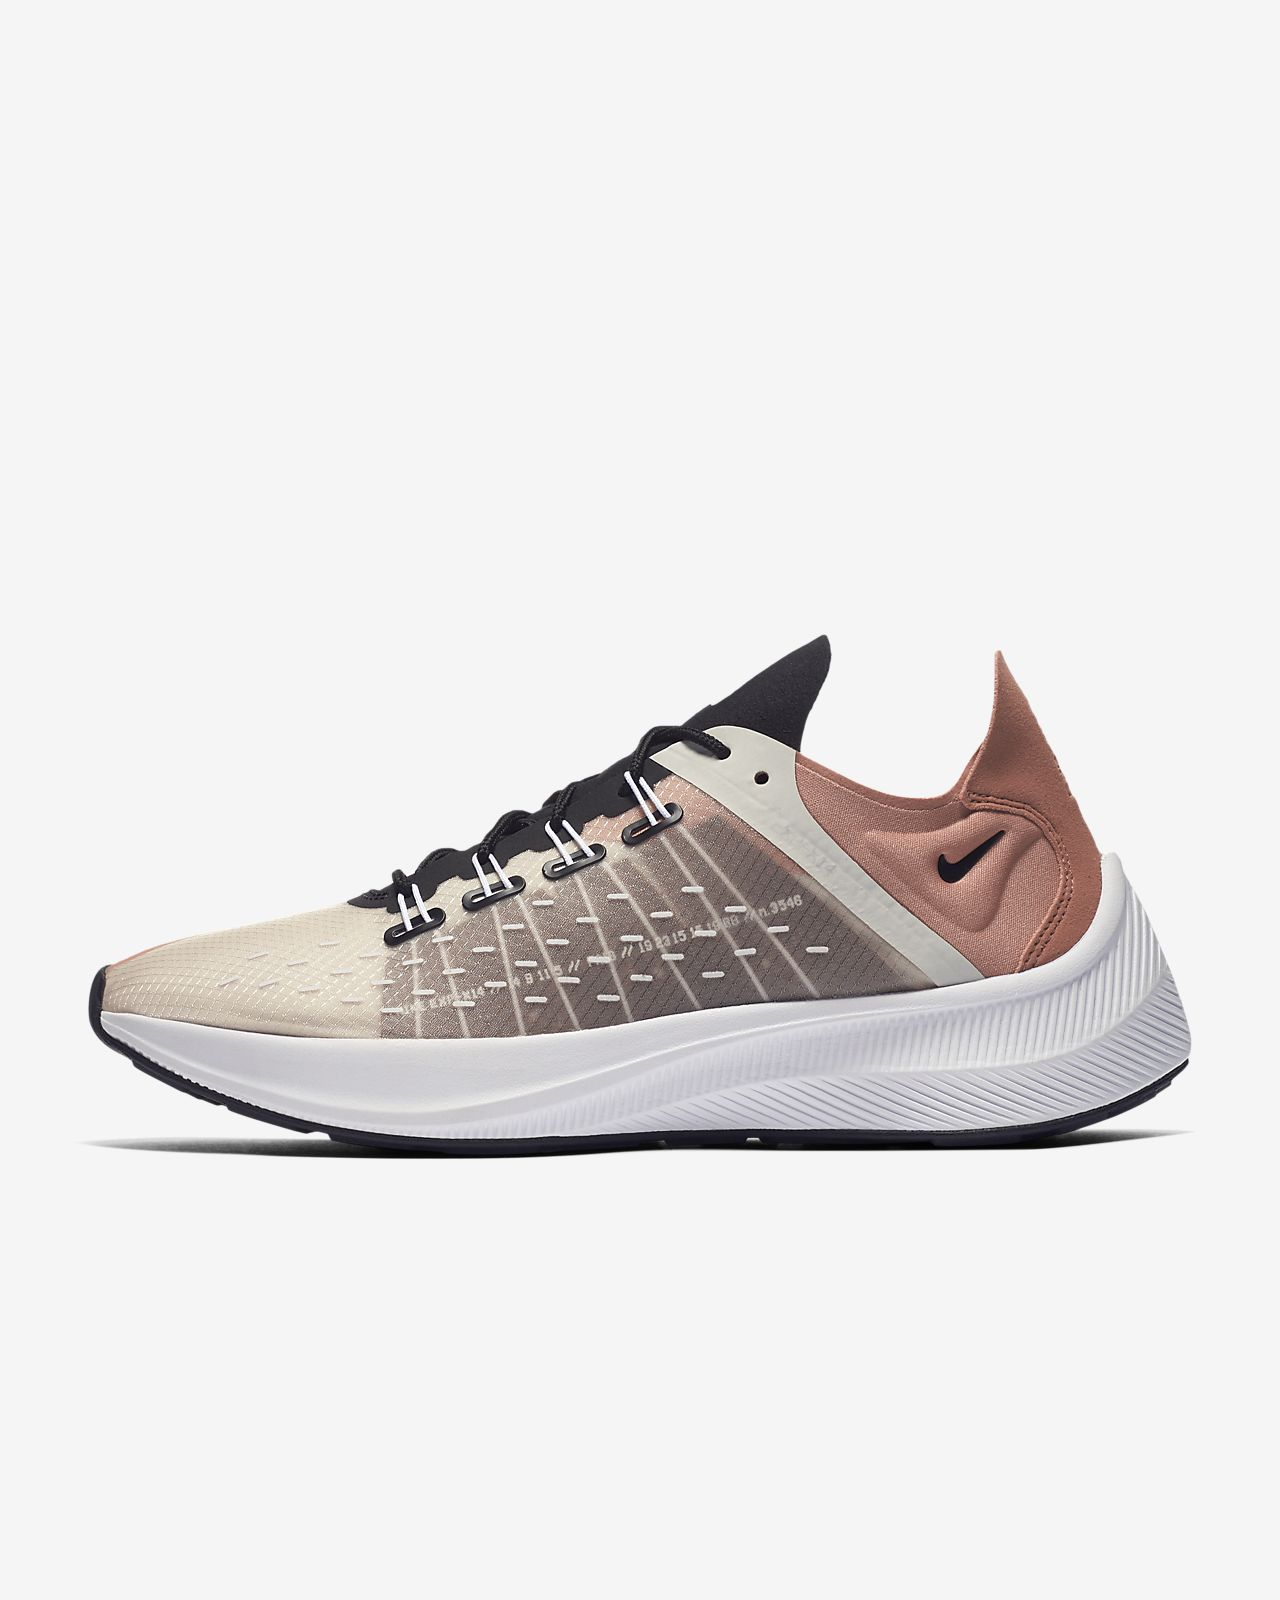 best loved 4741f 4fed2 50% off nike lunar elite femmes fonctionnement chaussure 6ab8a 16d3c